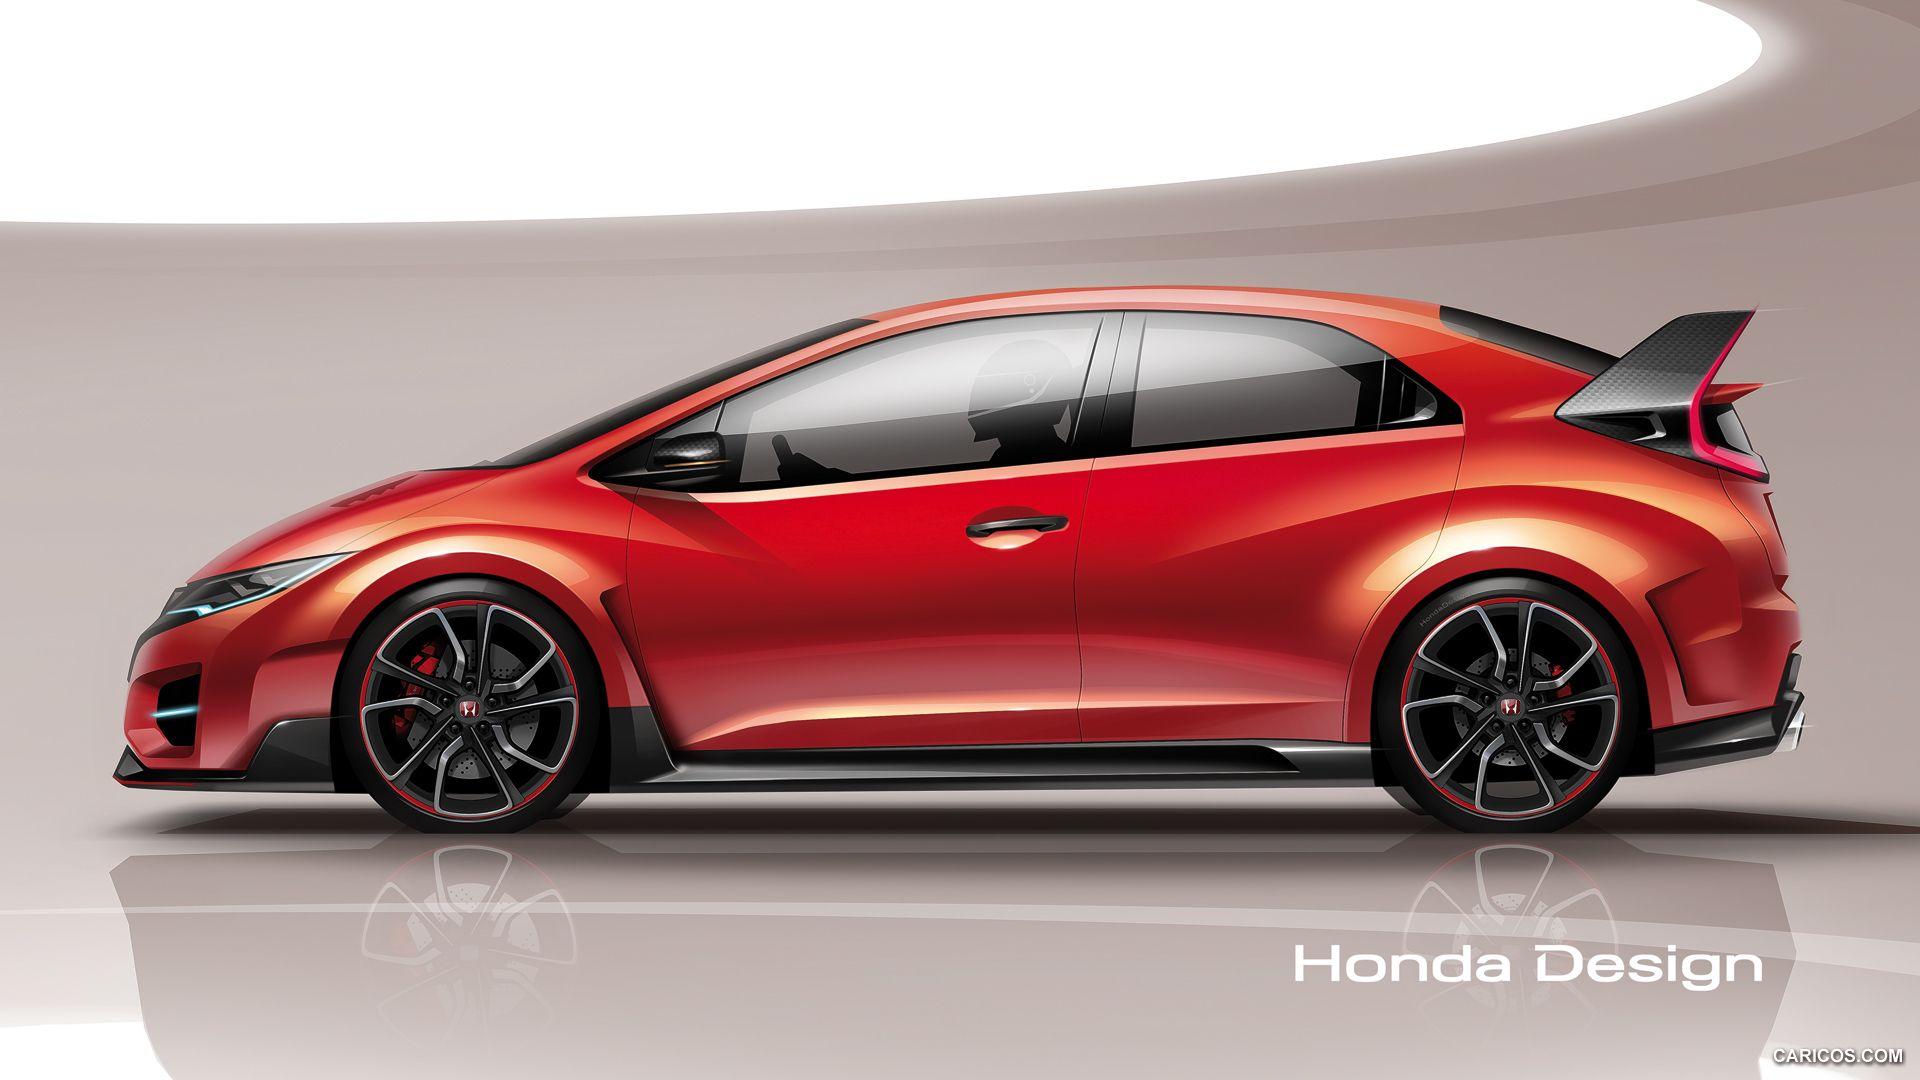 2014 Honda Civic Type R Concept Wallpaper | car sketch | Pinterest ...